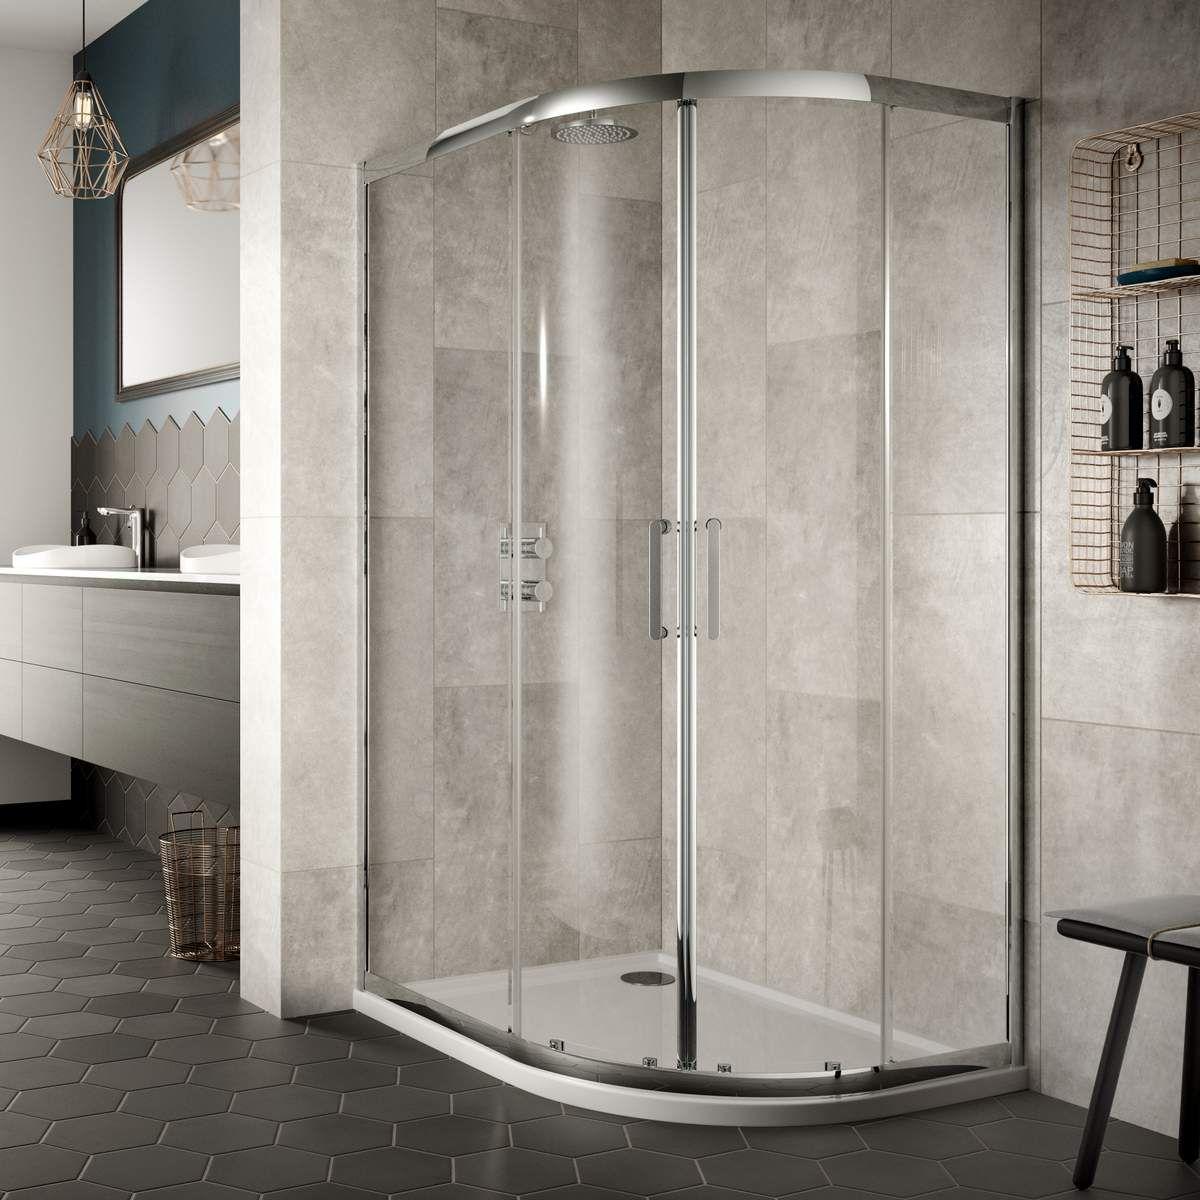 Sommer 8 Double Door Offset Quadrant Shower Enclosure : UK Bathrooms